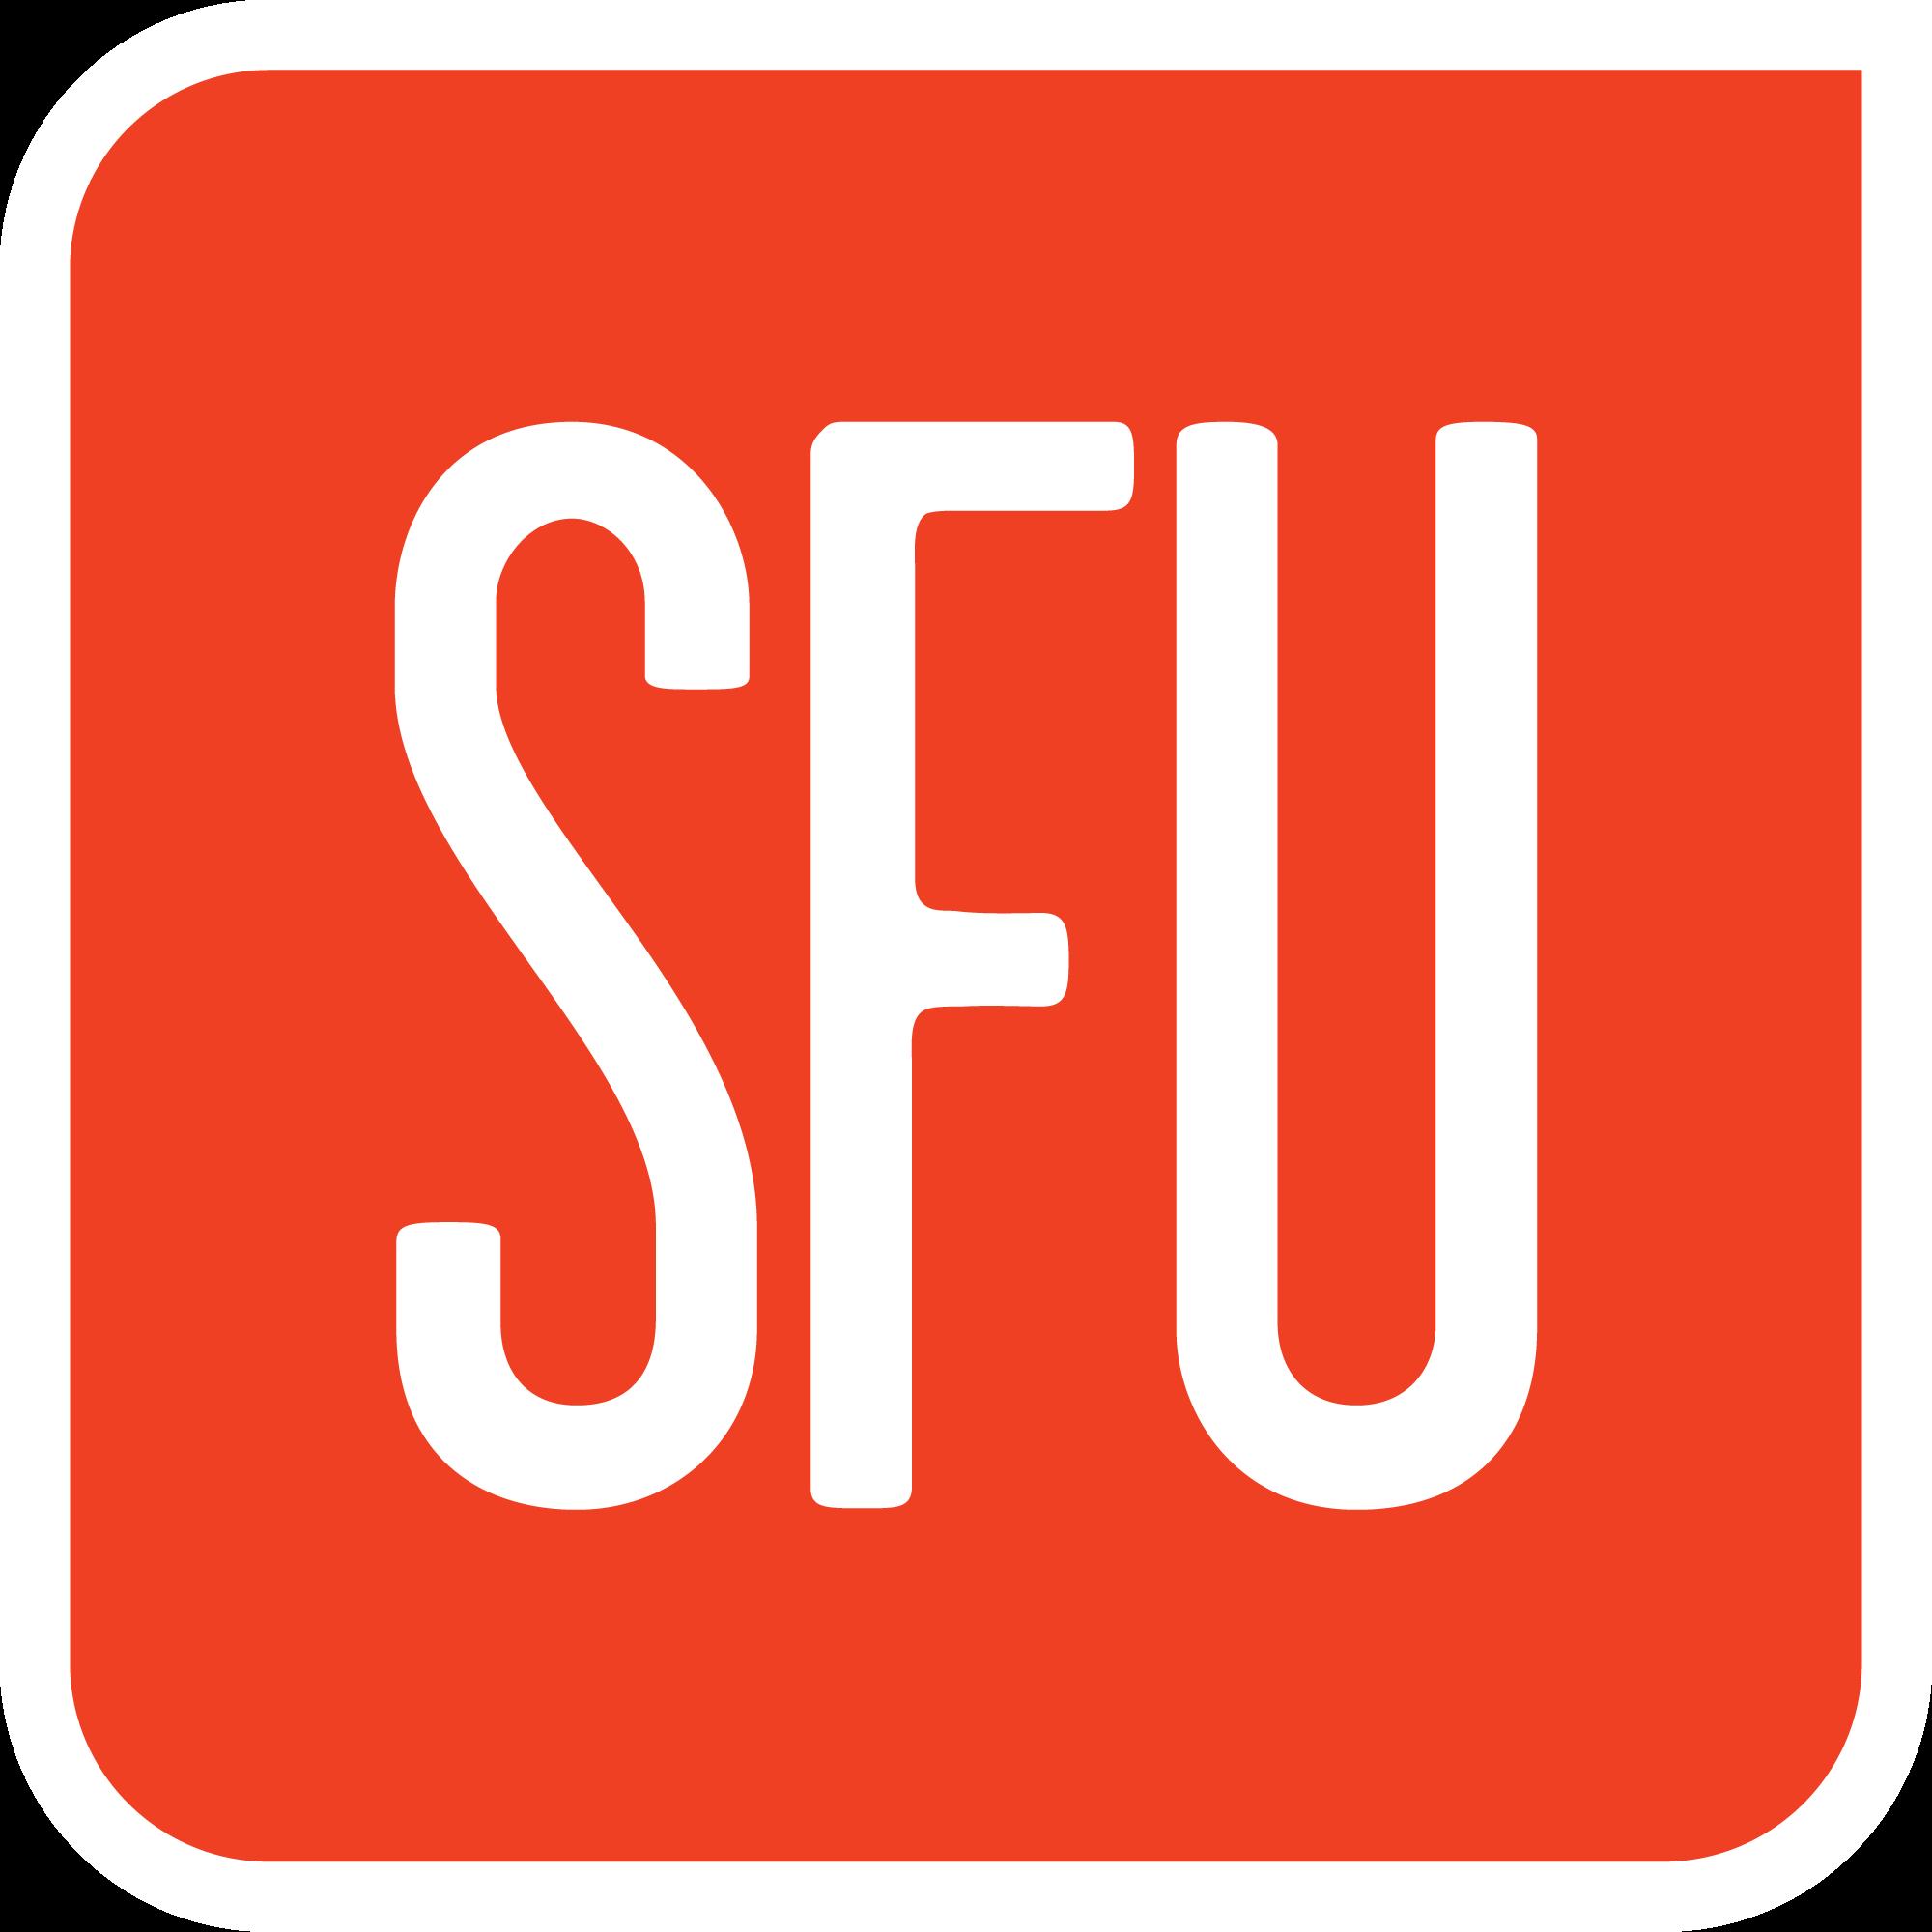 SFU-logo-rent_cmyk_neg_2000x2000.png